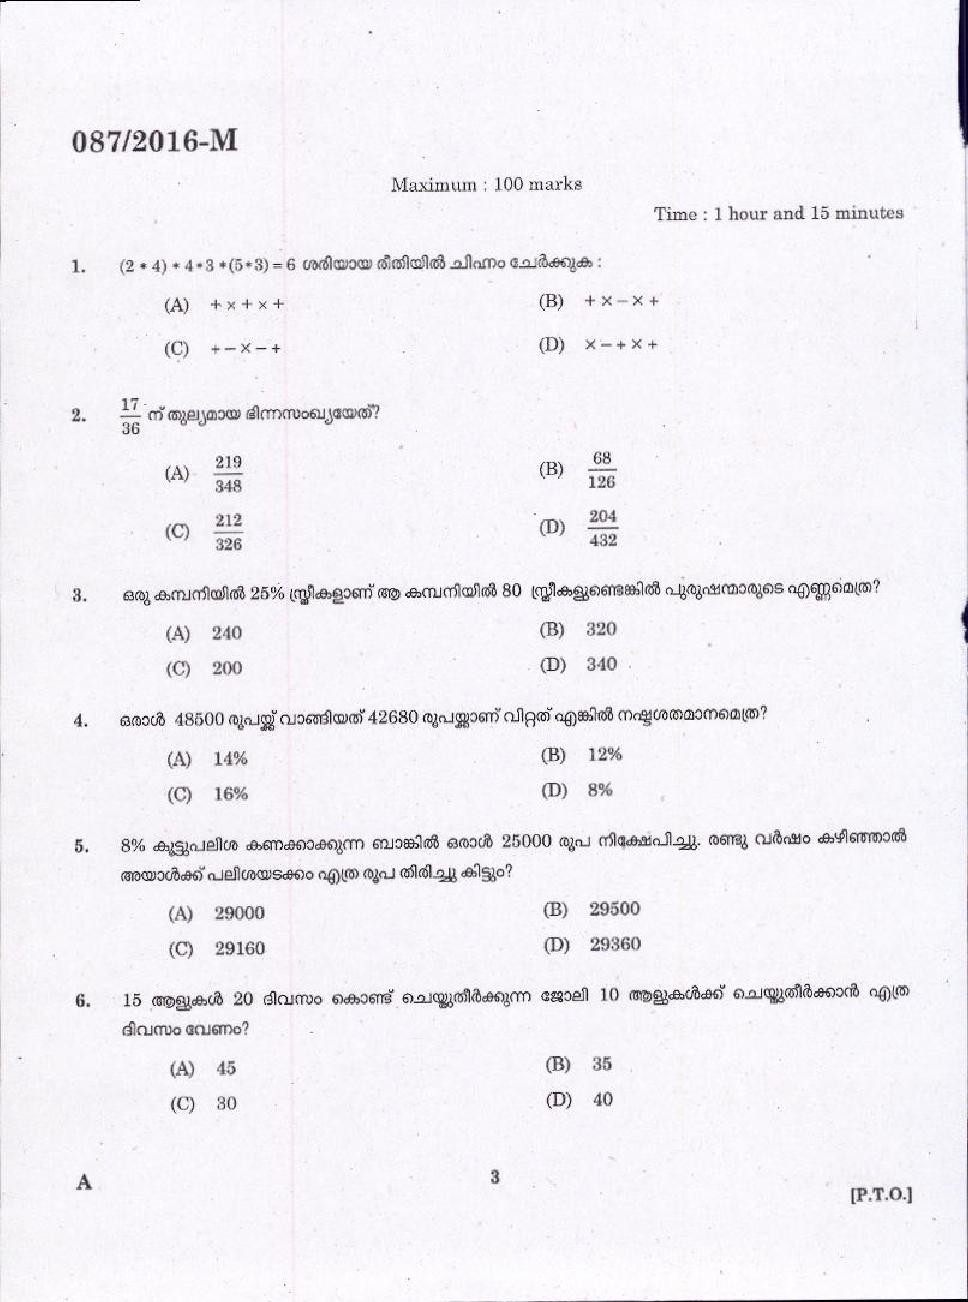 http://masterstudy.net//pdf/psc/village-extension-officer-gr-ii-rural-development/q_0872016-m0001.jpg